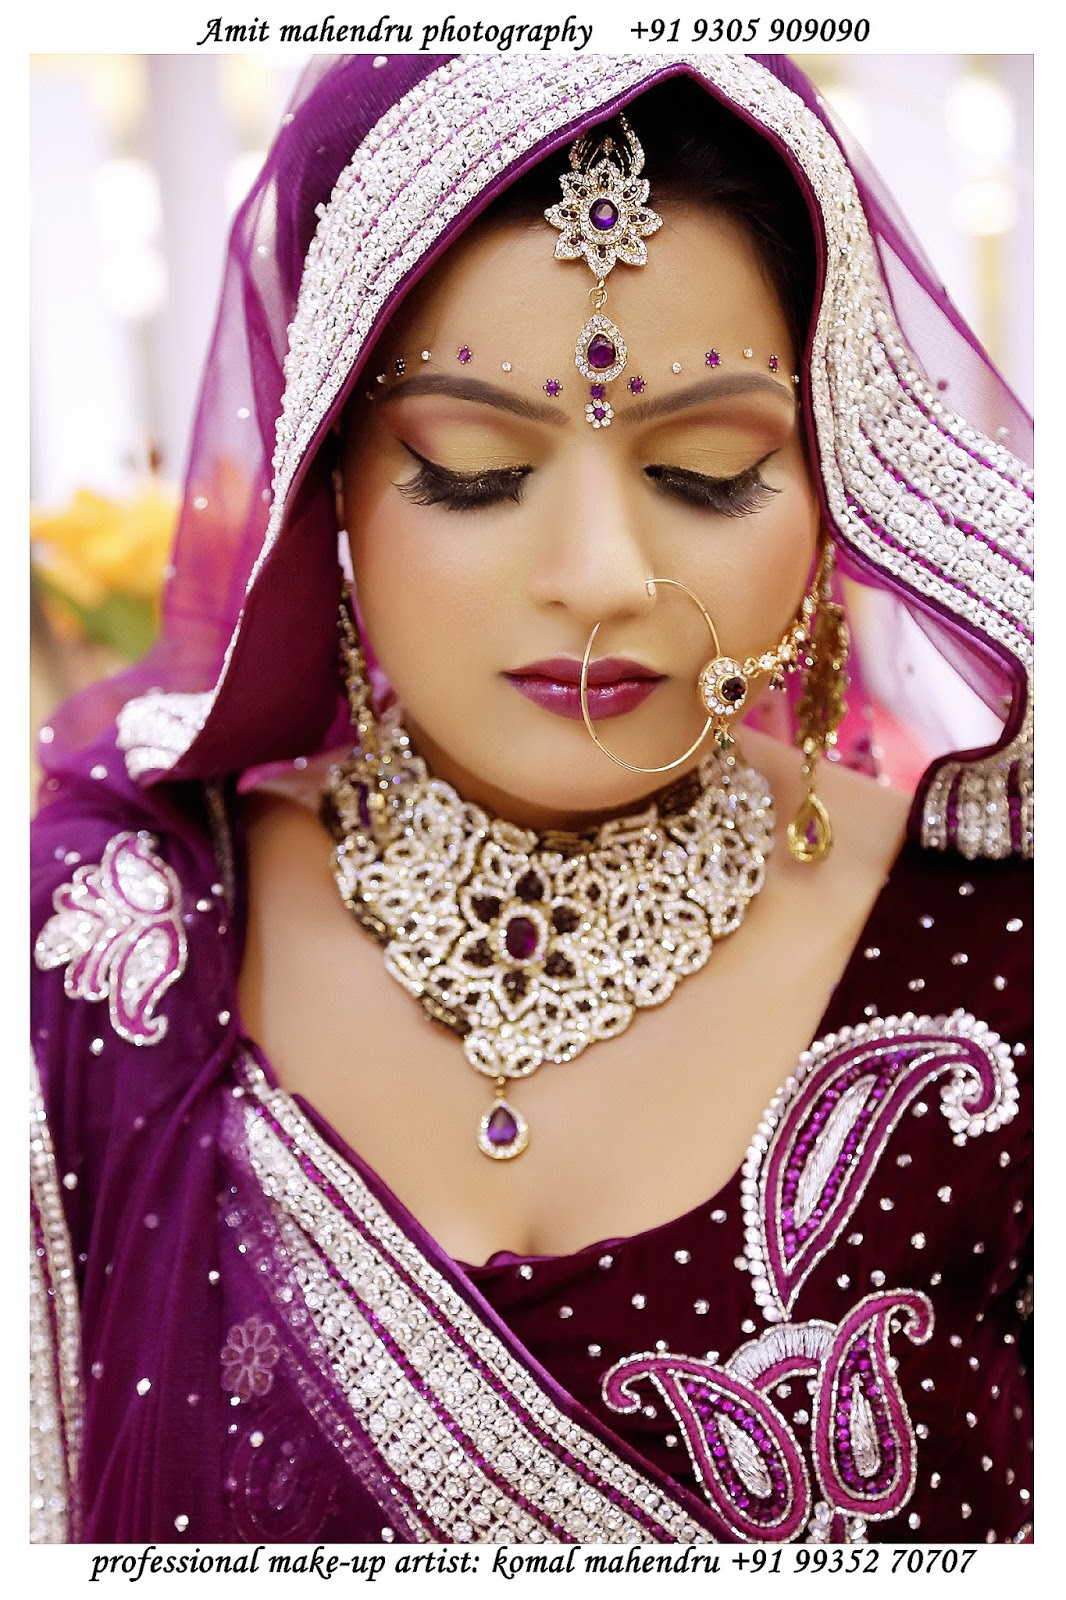 Komal mahendru s professional makeup lucknow india bridal makeup - Best Bridal Makeup Artist In Lucknow